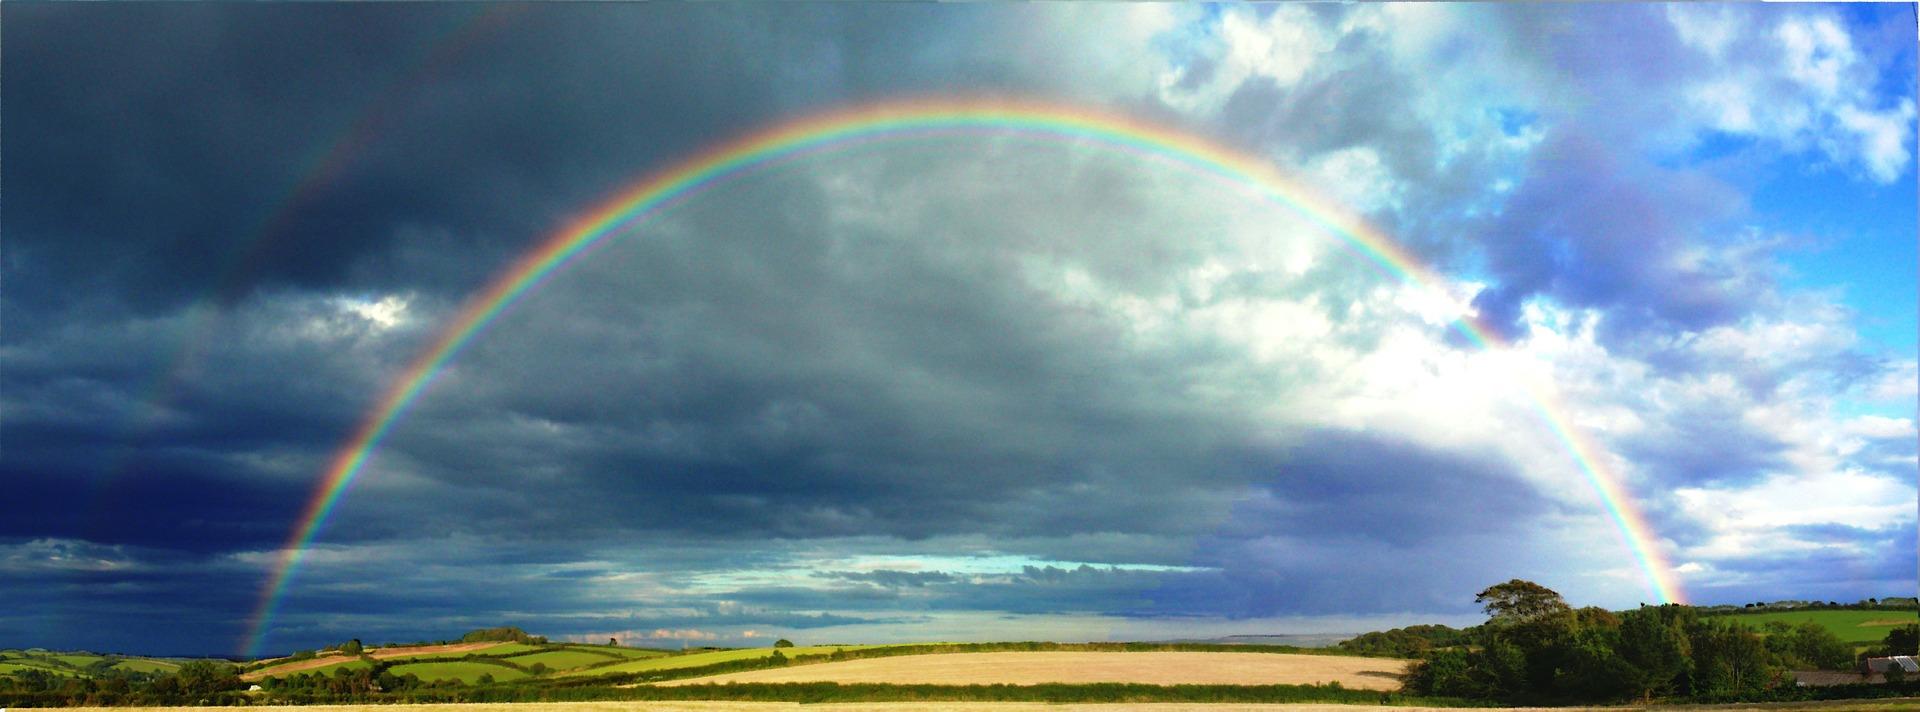 rainbow-1909_1920.jpg